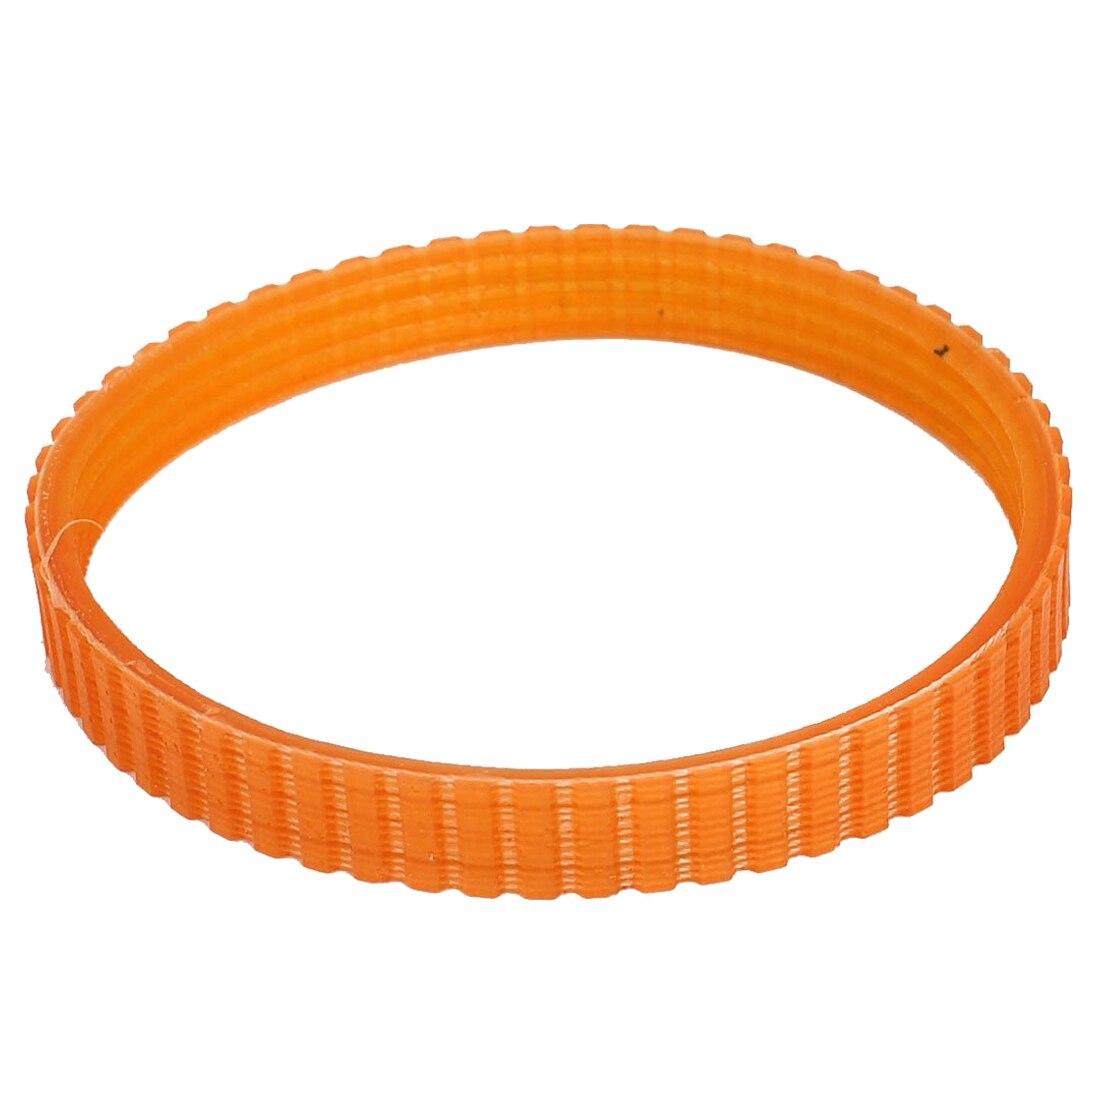 1 x orange PU belt suitable for Makita planer 1900B